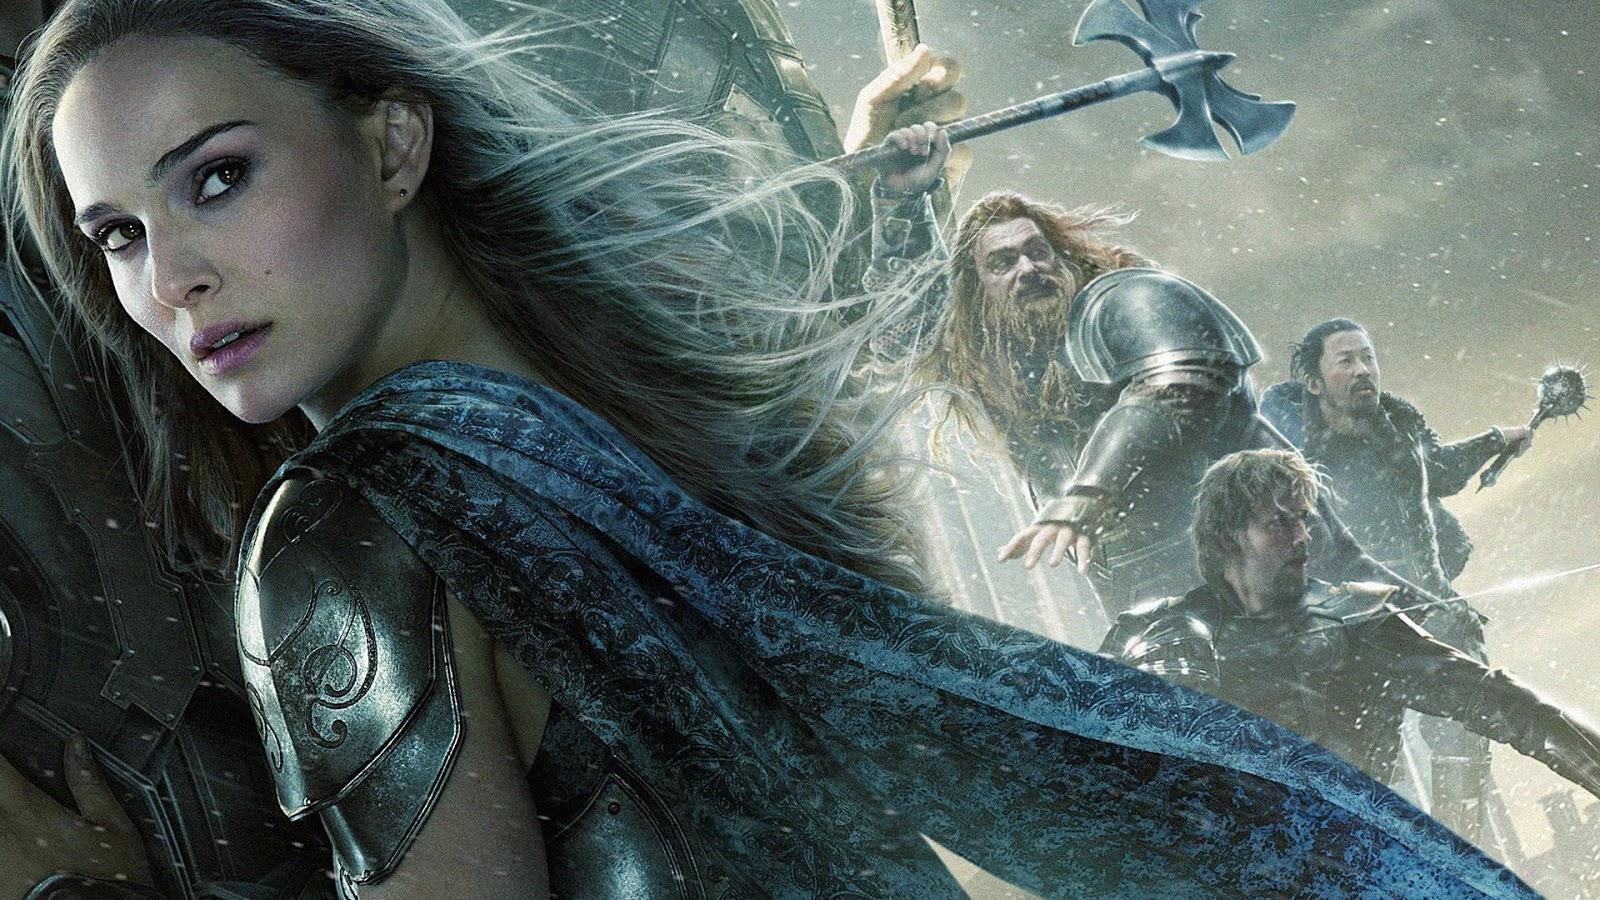 Natalie Portman Thor 2 Movie Wallpaper HD